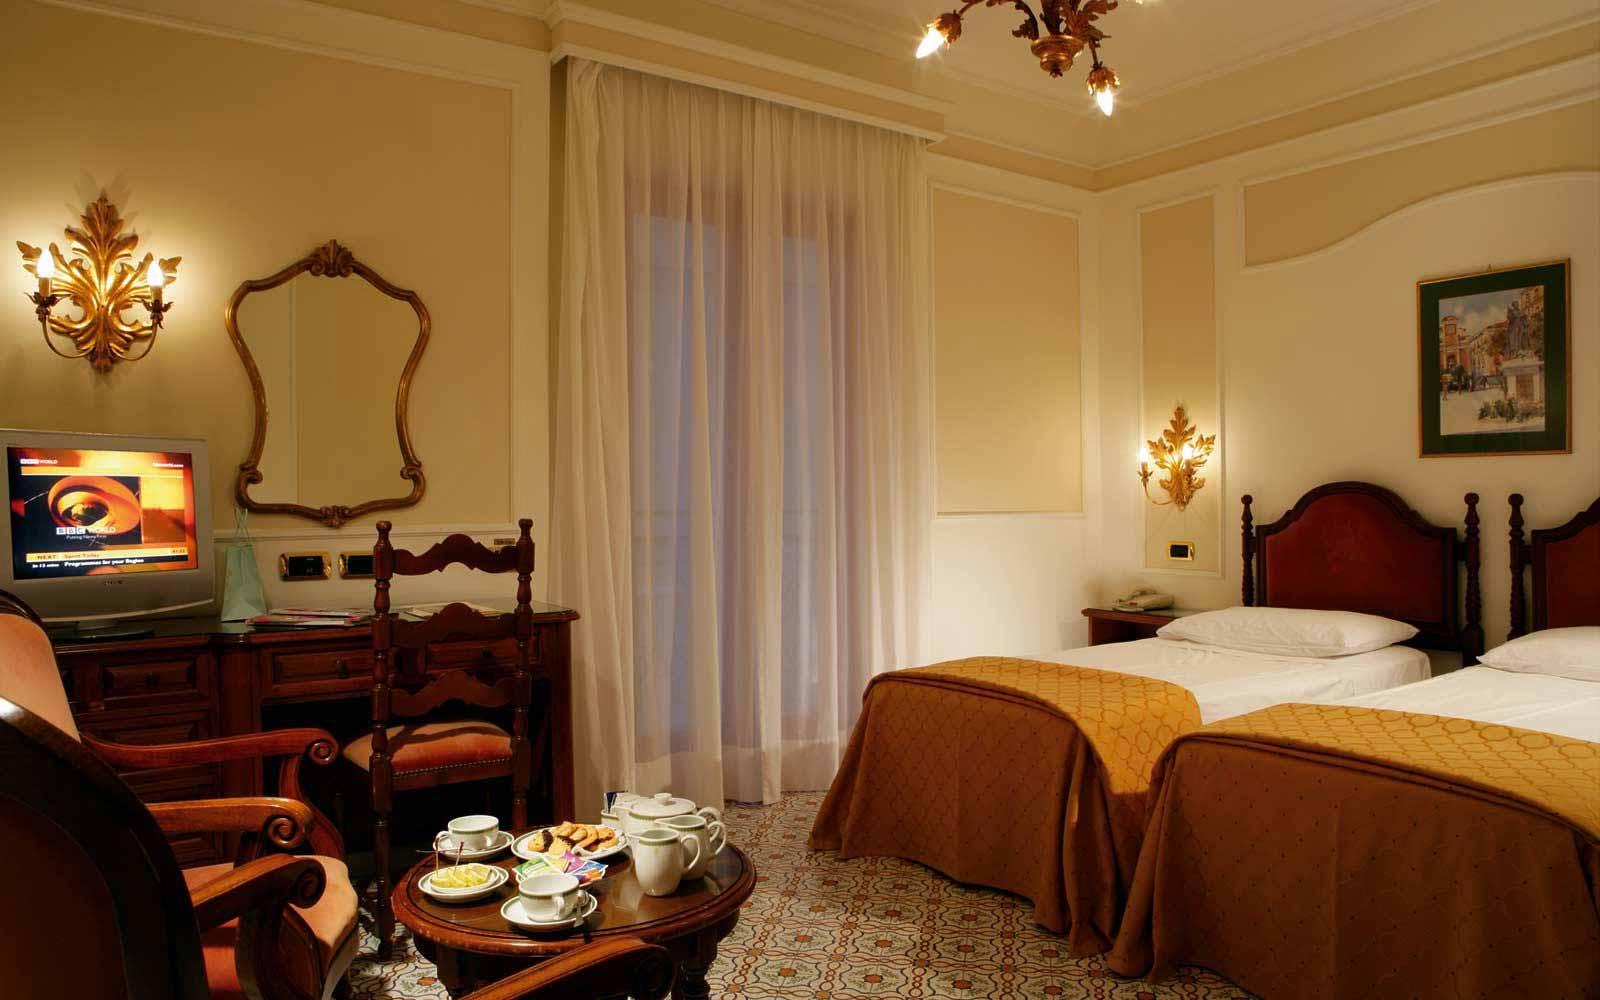 Double Room with a Balcony at Grand Hotel de la Ville